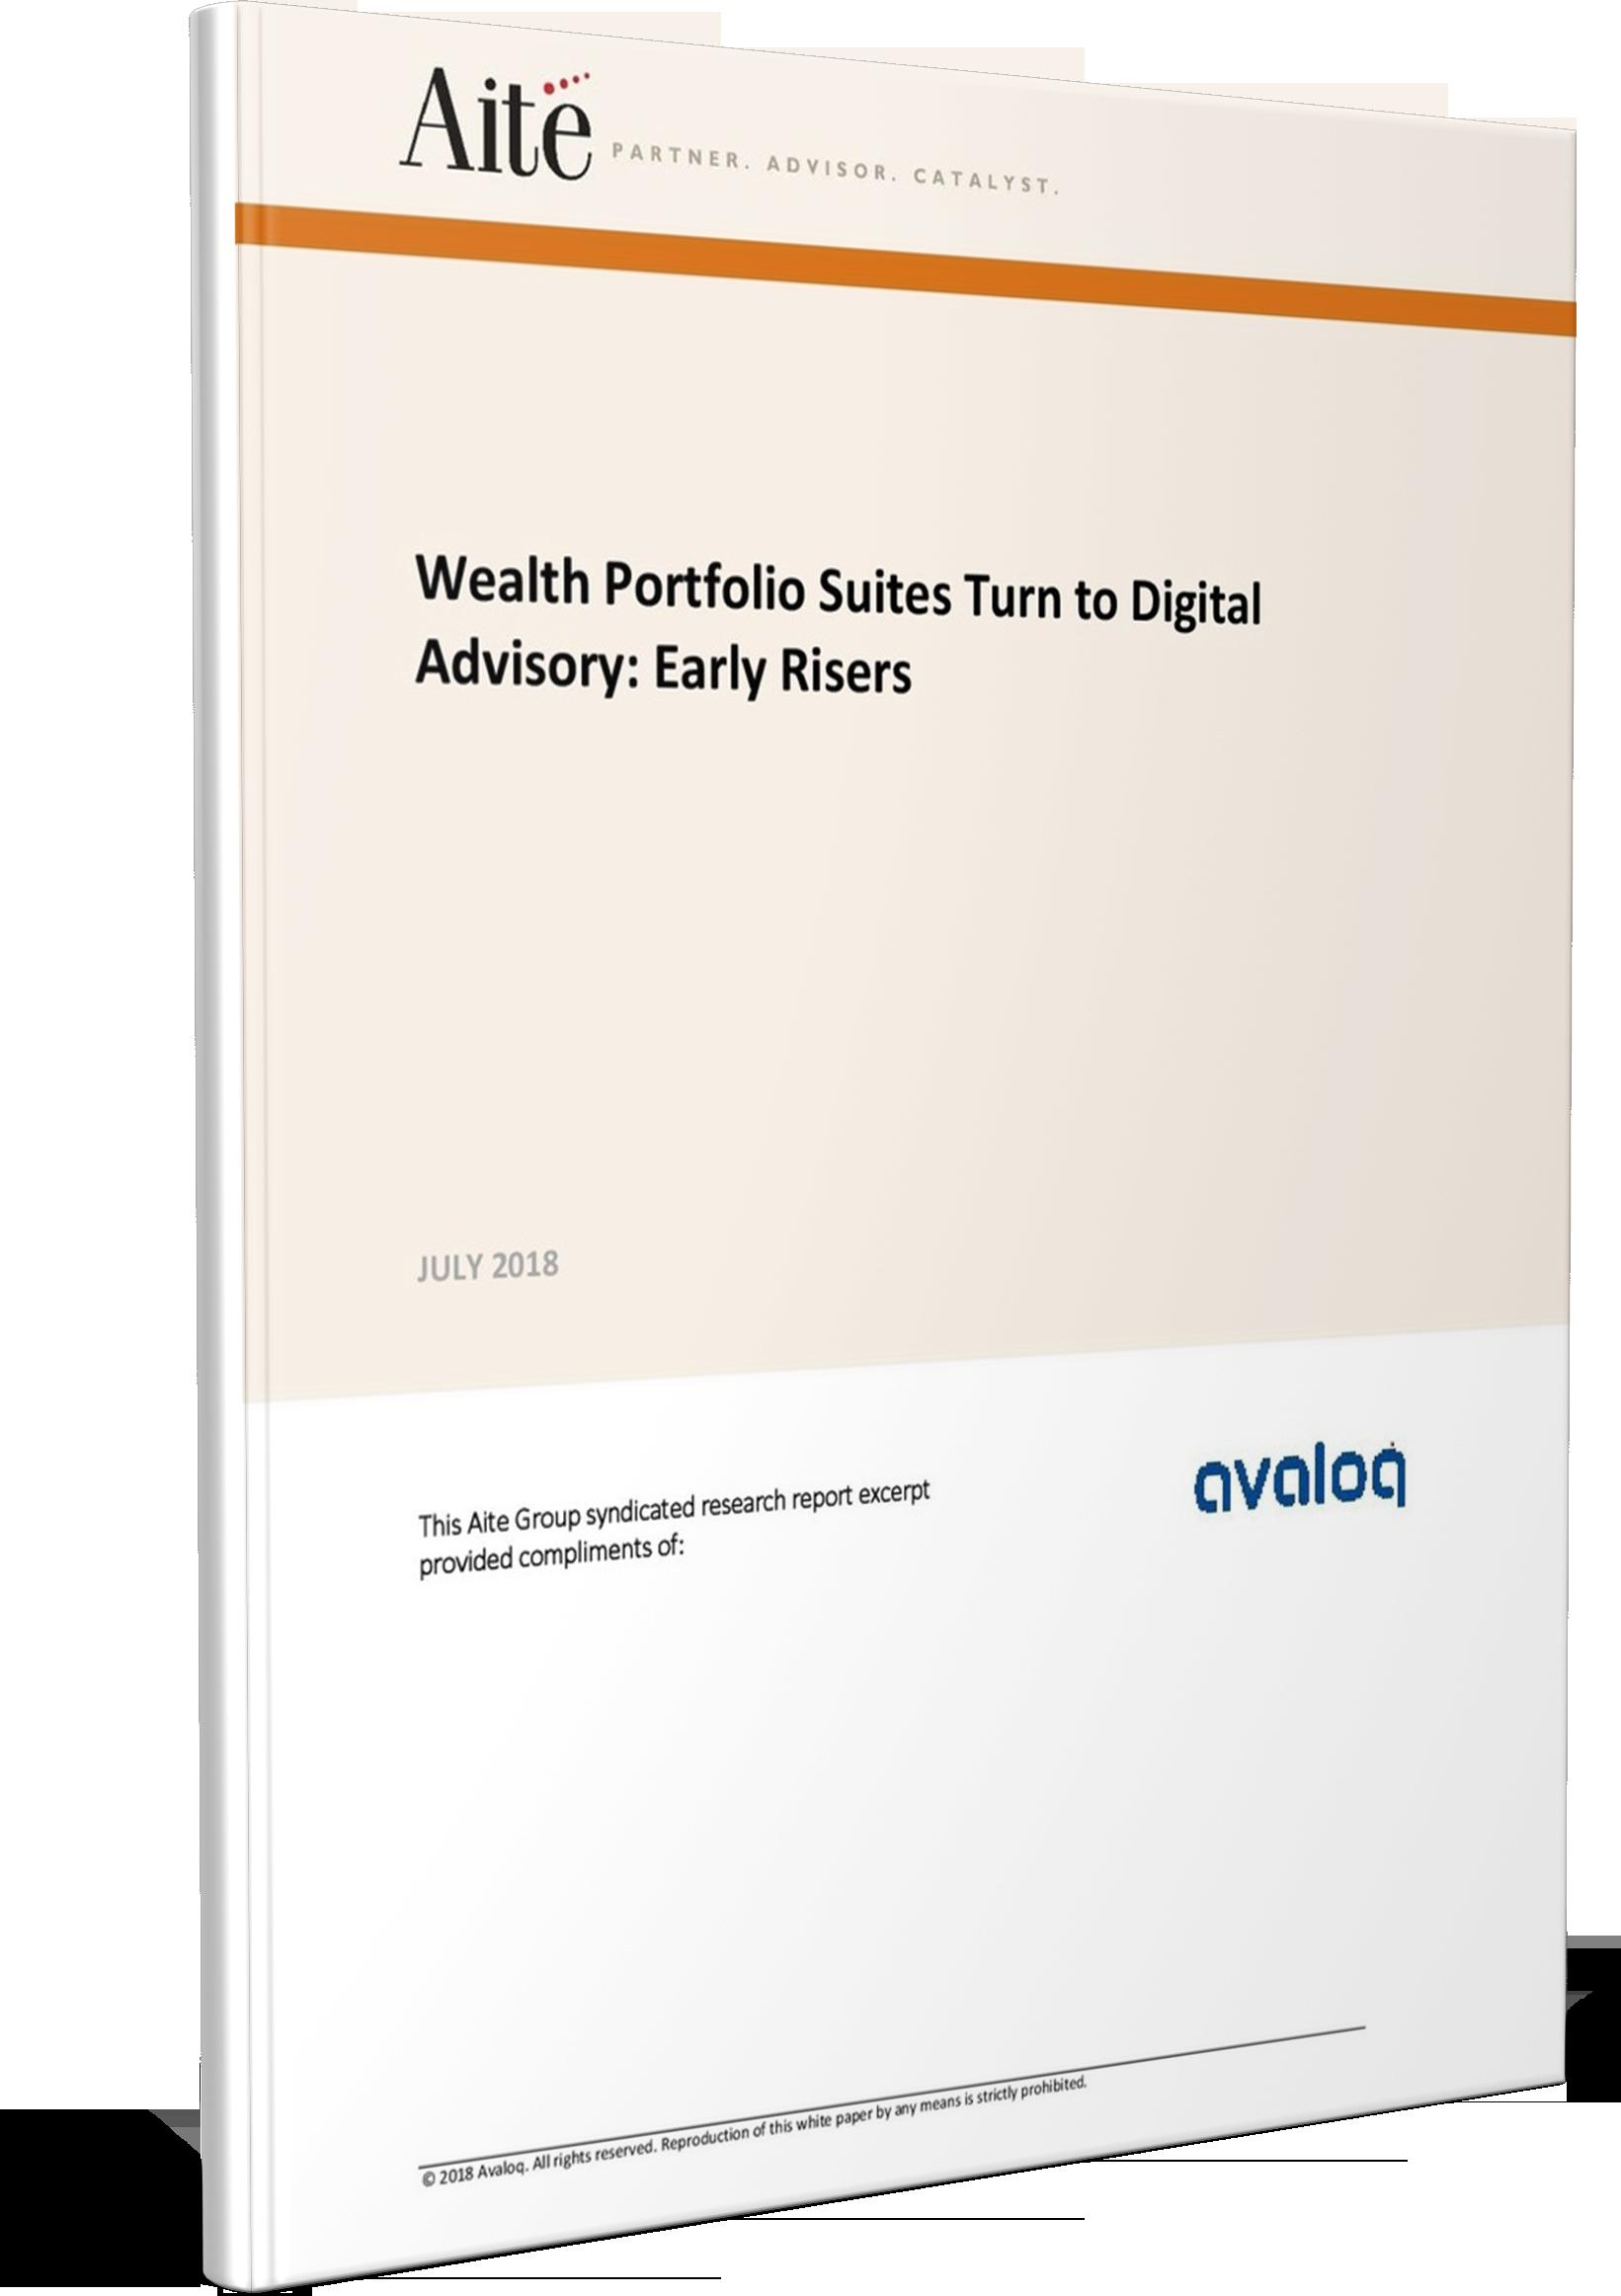 3D_Cover Aite WP Wealth portfolio suites turn to digital advisory_UK